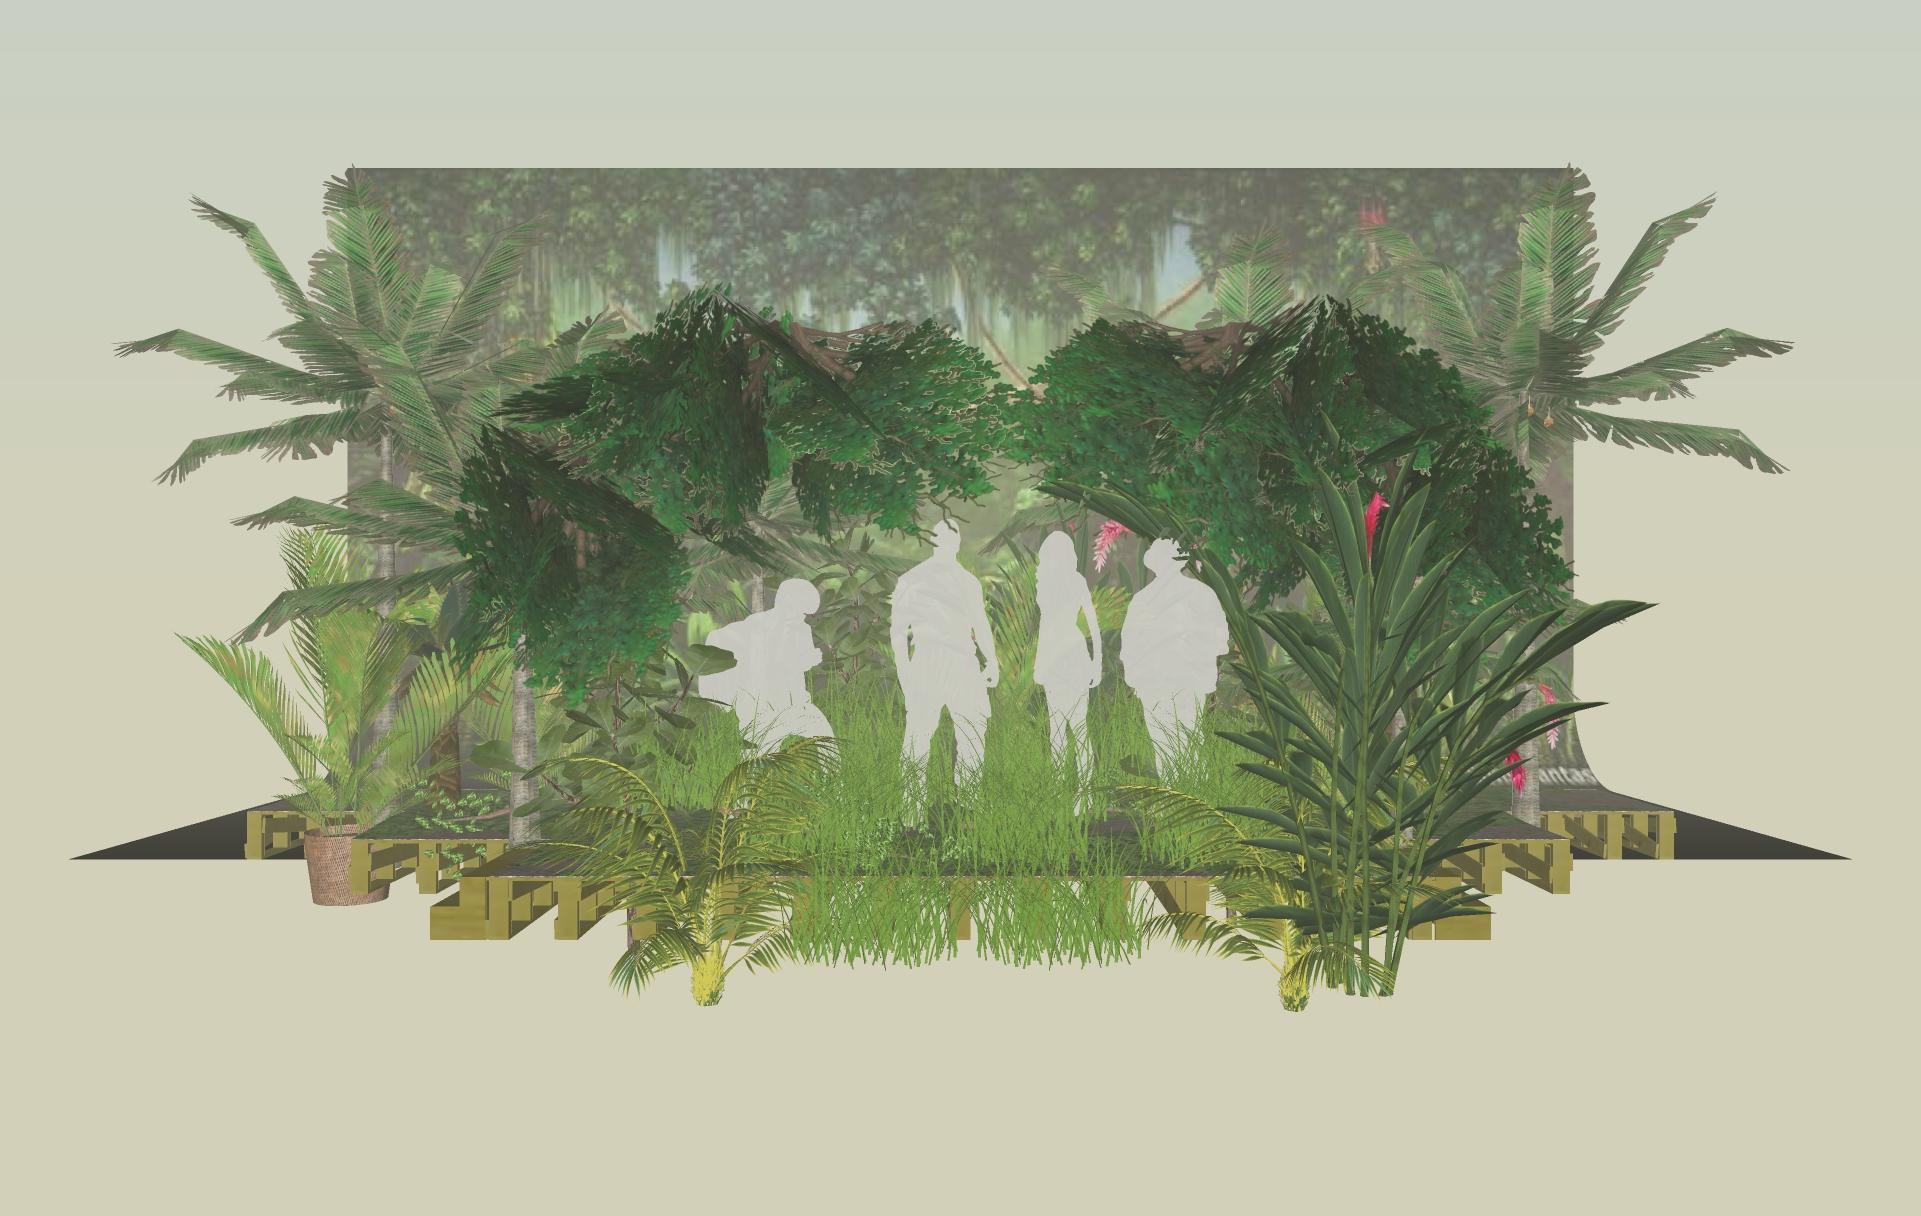 Discovery - Jumanji Promo